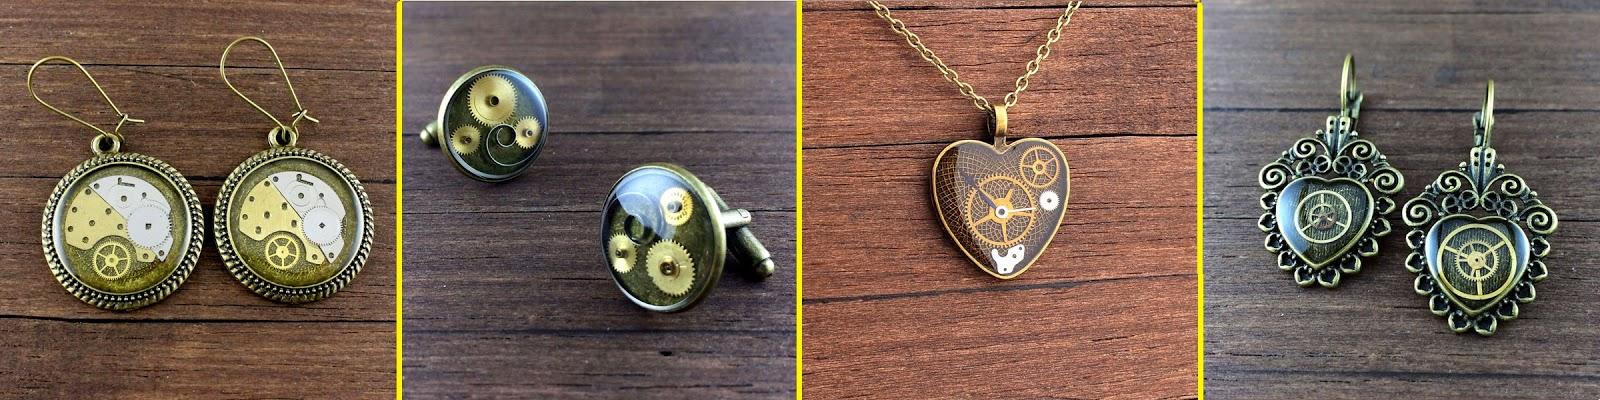 f37a0aa7d1 ΚΑΘΗΜΕΡΙΝΟ ΡΟΥΚΟΥΜΟΥΚΟΥ  5.Όμορφα κοσμήματα από παλιά εξαρτήματα ...